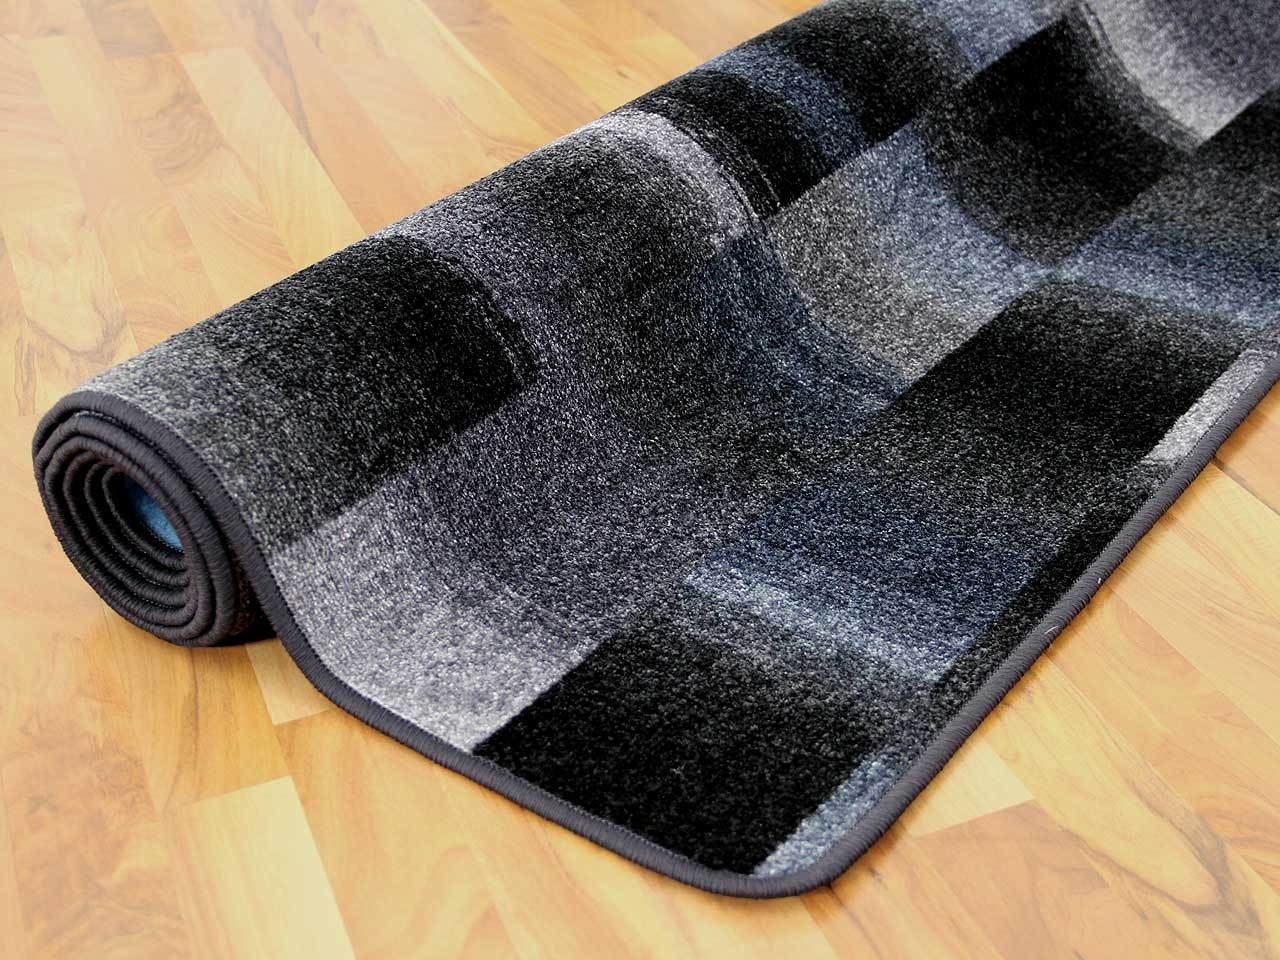 Designer Velour Teppich Mystic Karo Blau Grau Teppiche